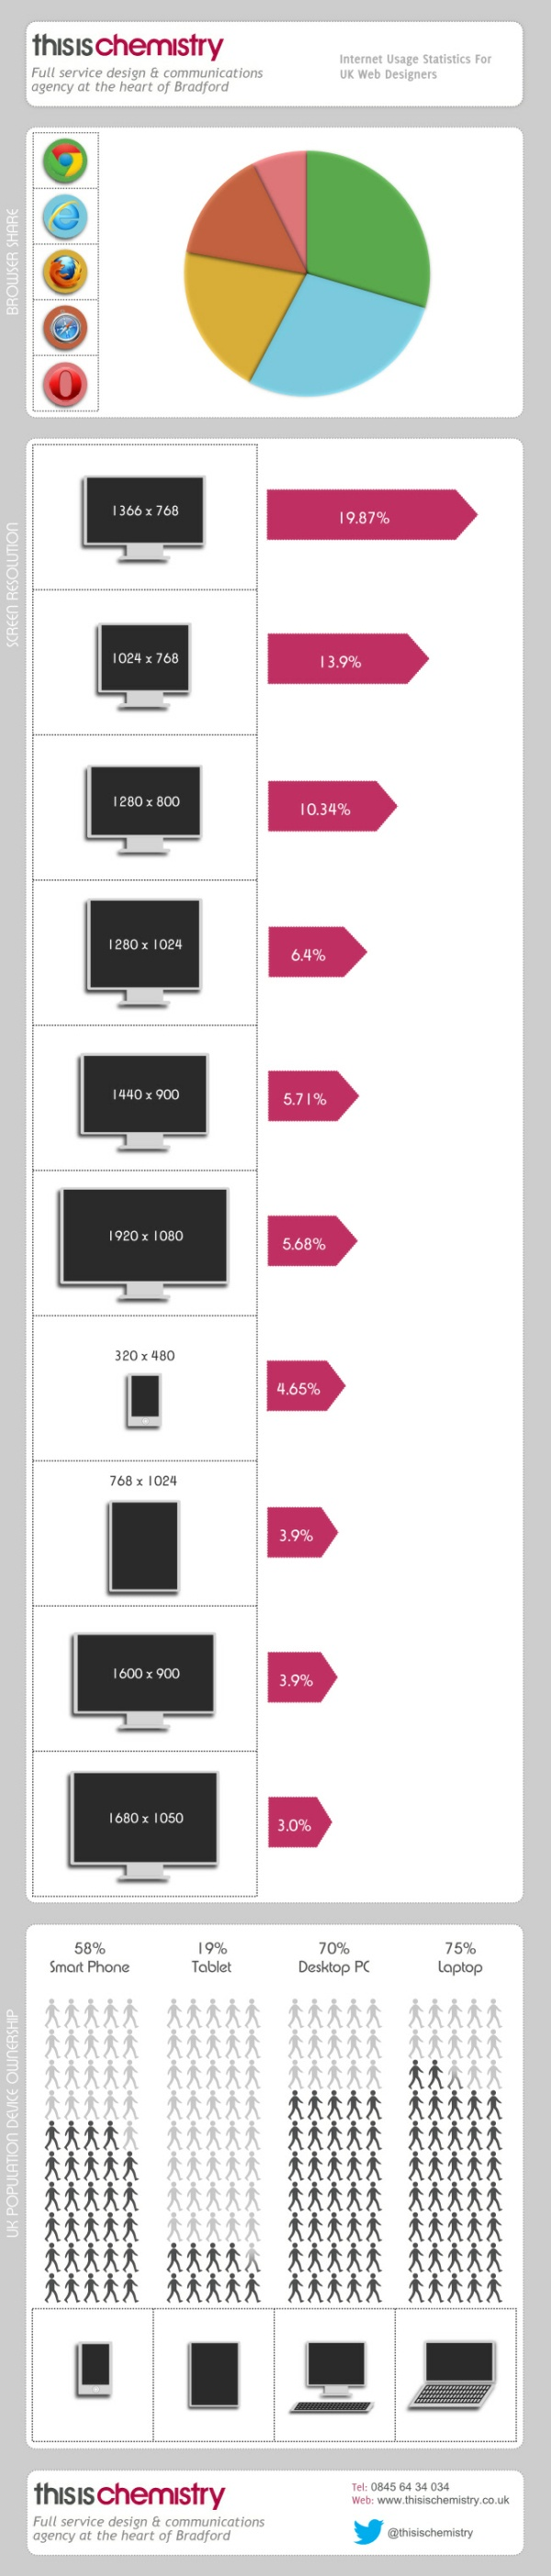 Internet Usage Statistics For UK Web Designers